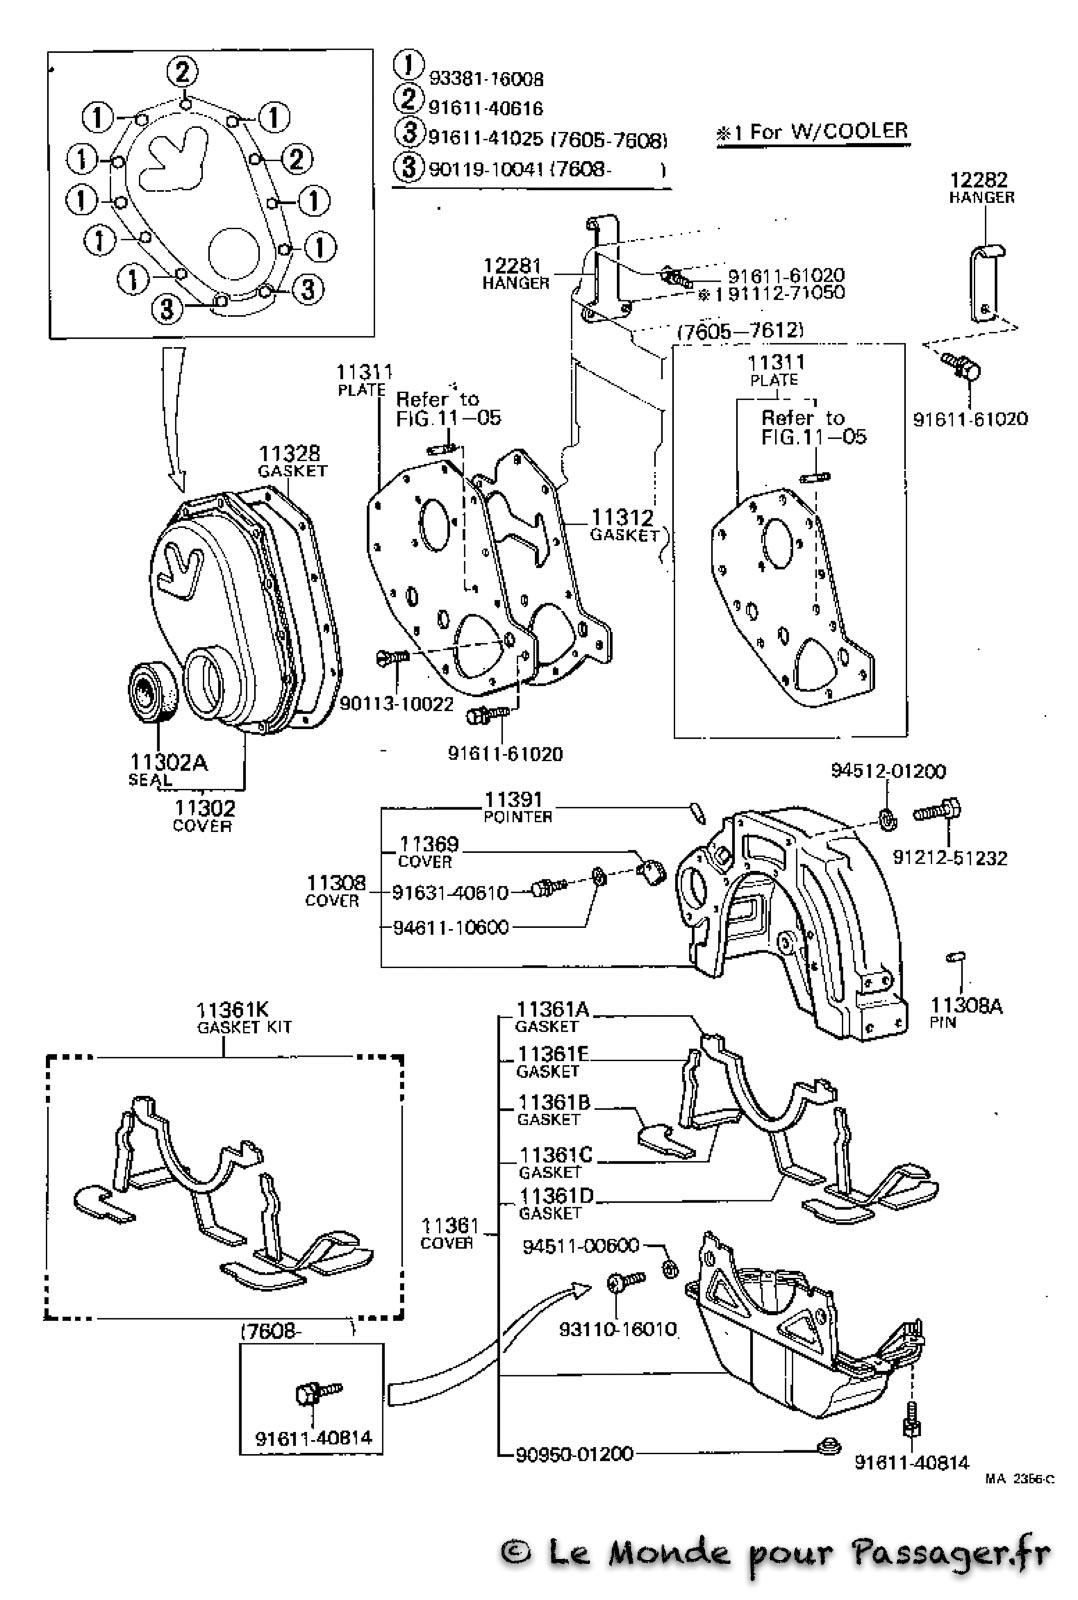 Fj55-Eclatés-Techniques160